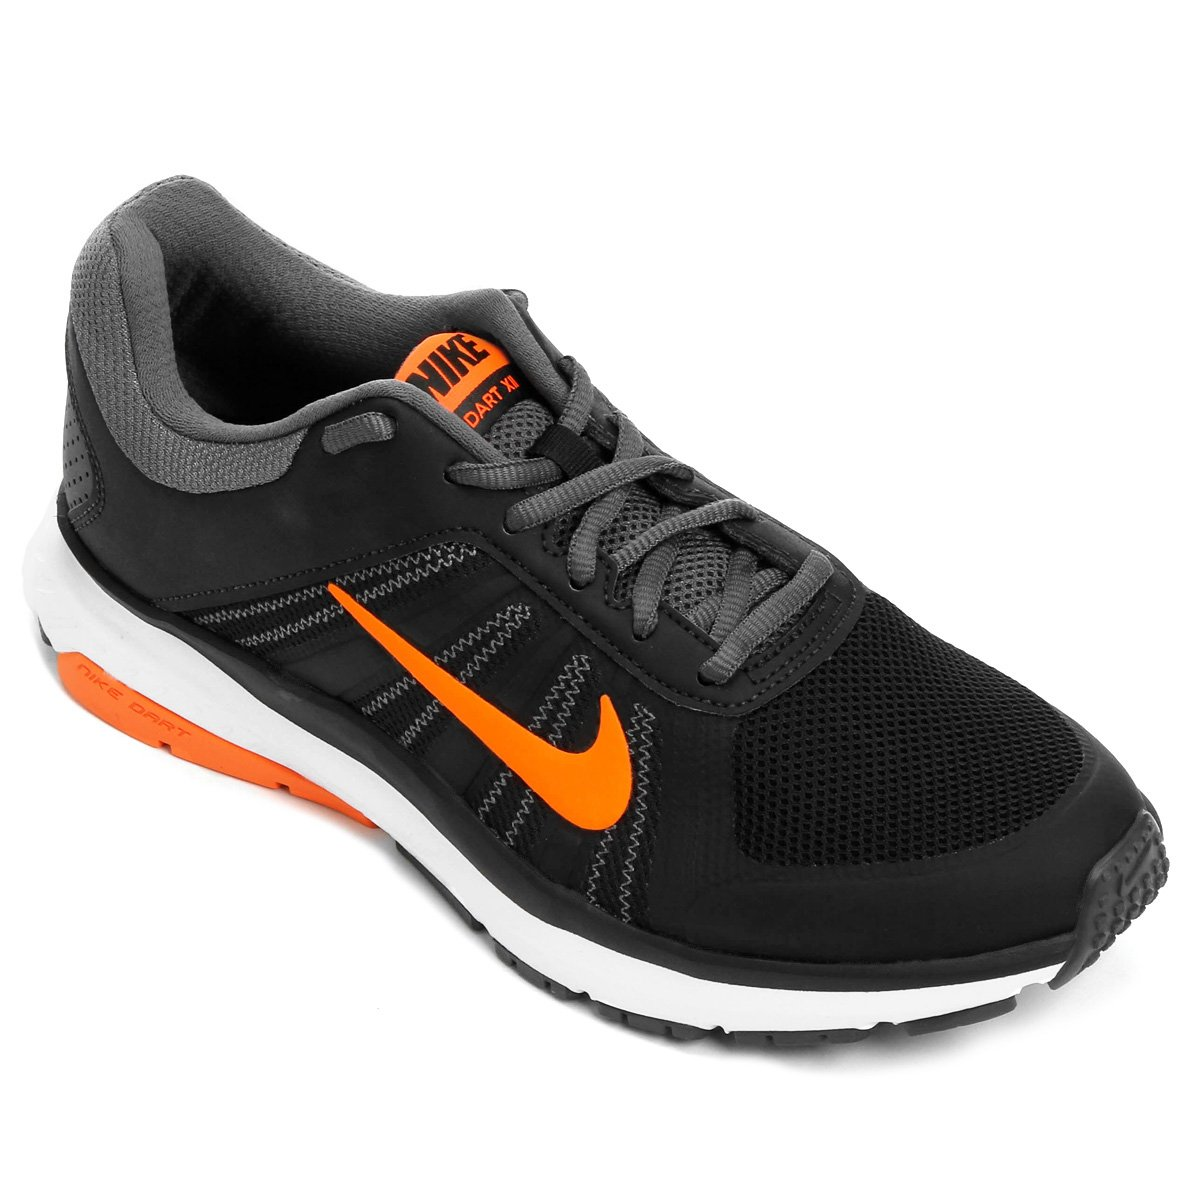 76b2ebf87 Tênis Nike Dart 12 MSL Masculino - Preto e Laranja - Compre Agora ...